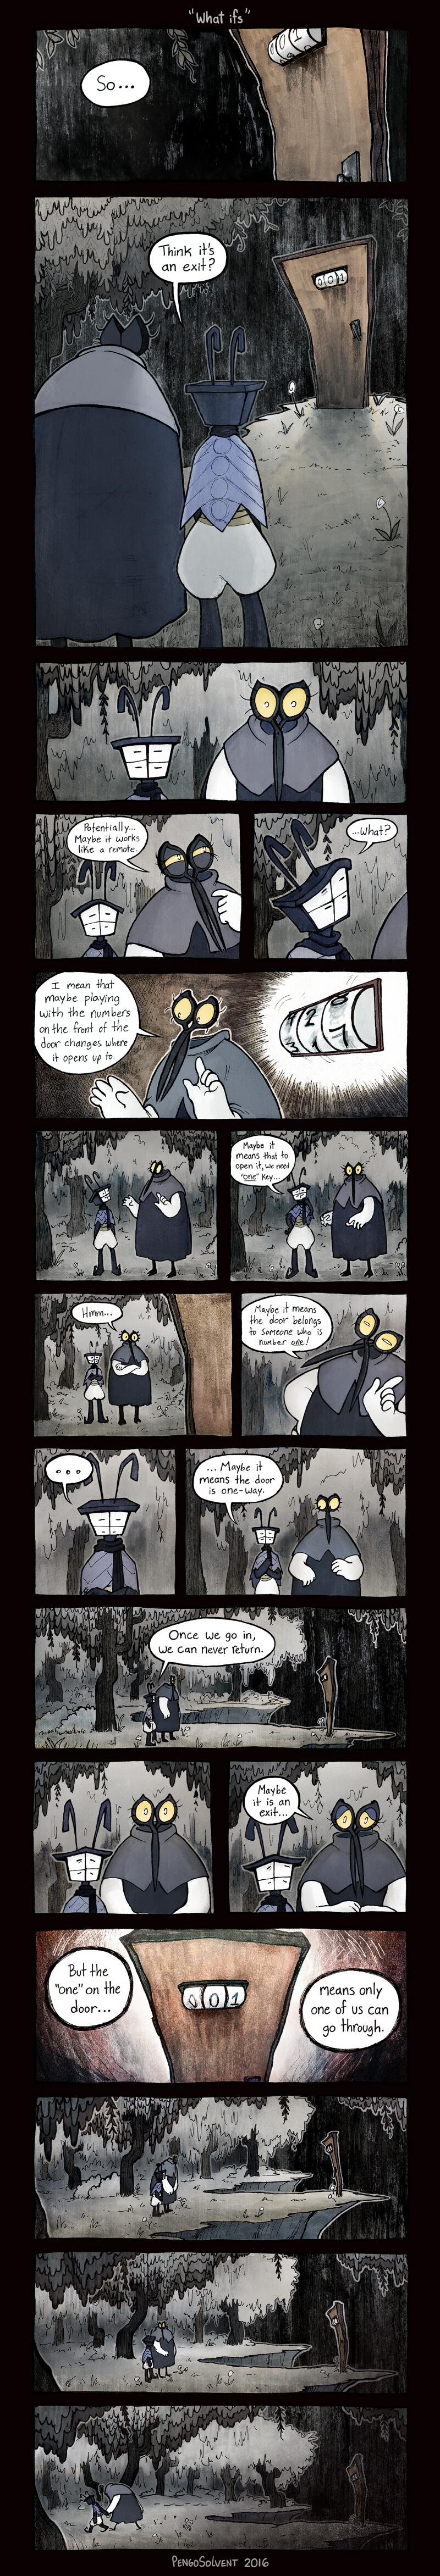 ObjectHead Zine Comic